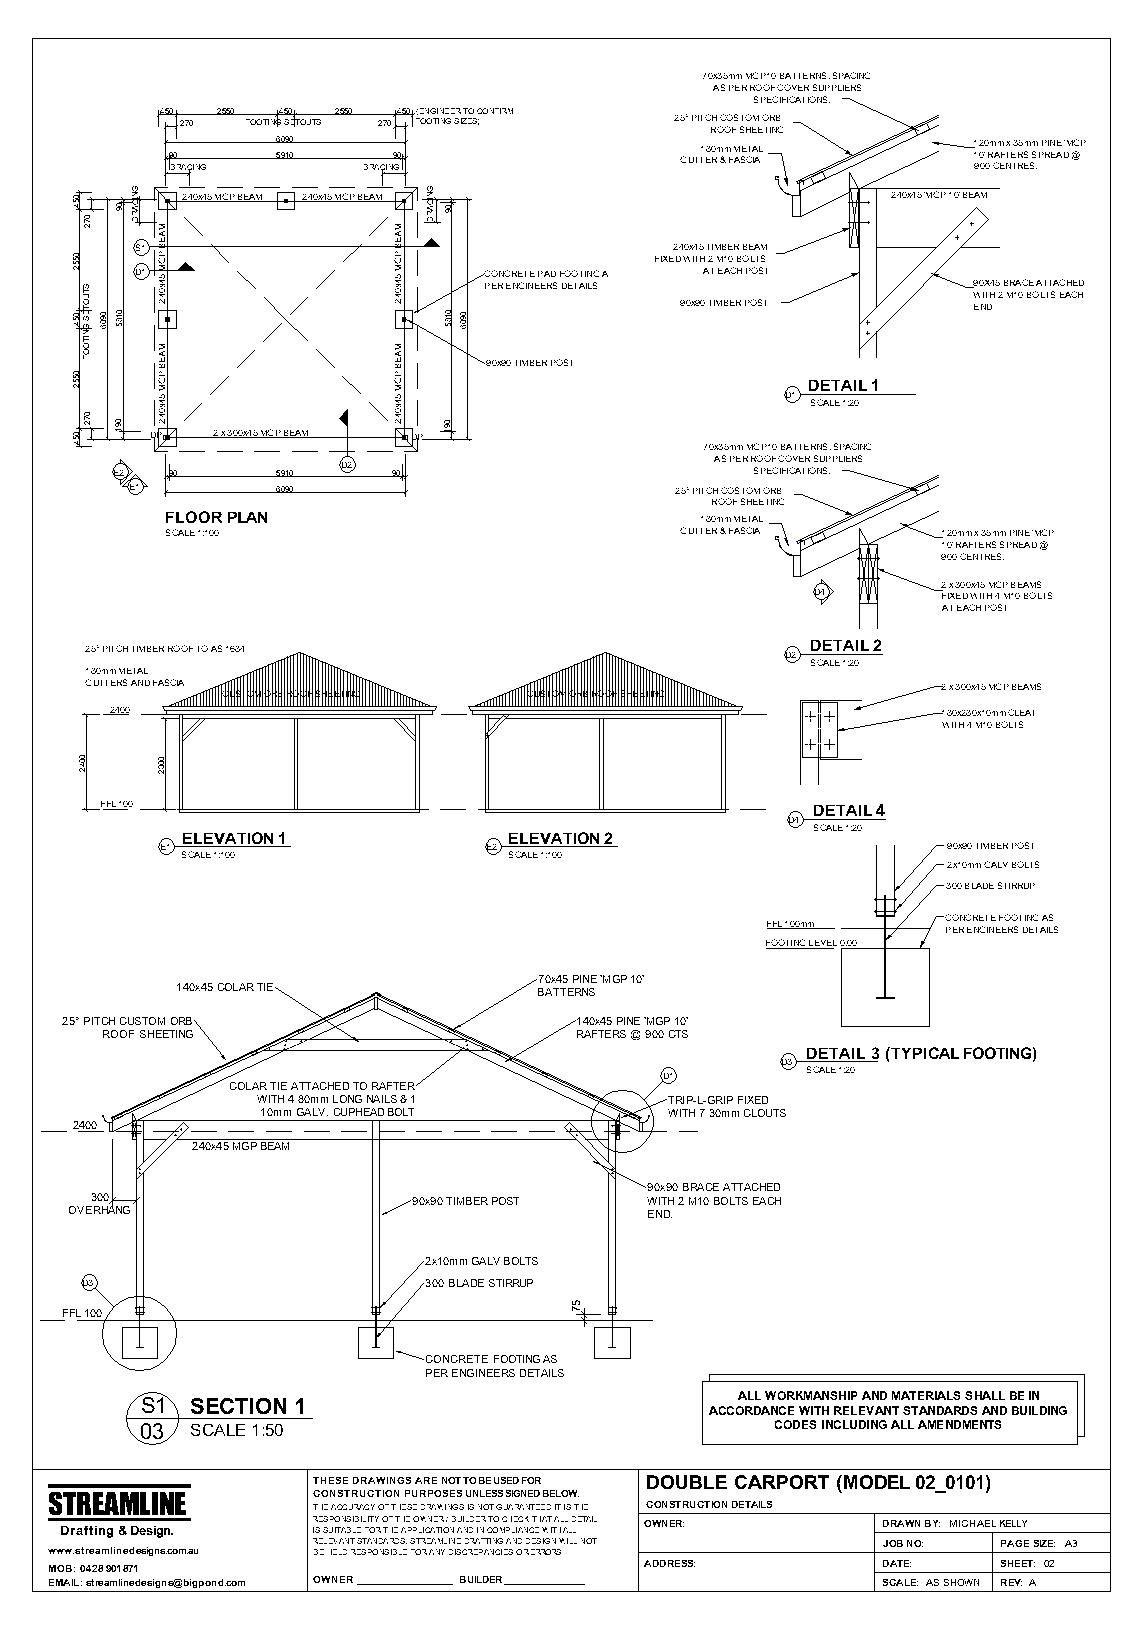 Download Free Carport Plans Building Carport Pinterest